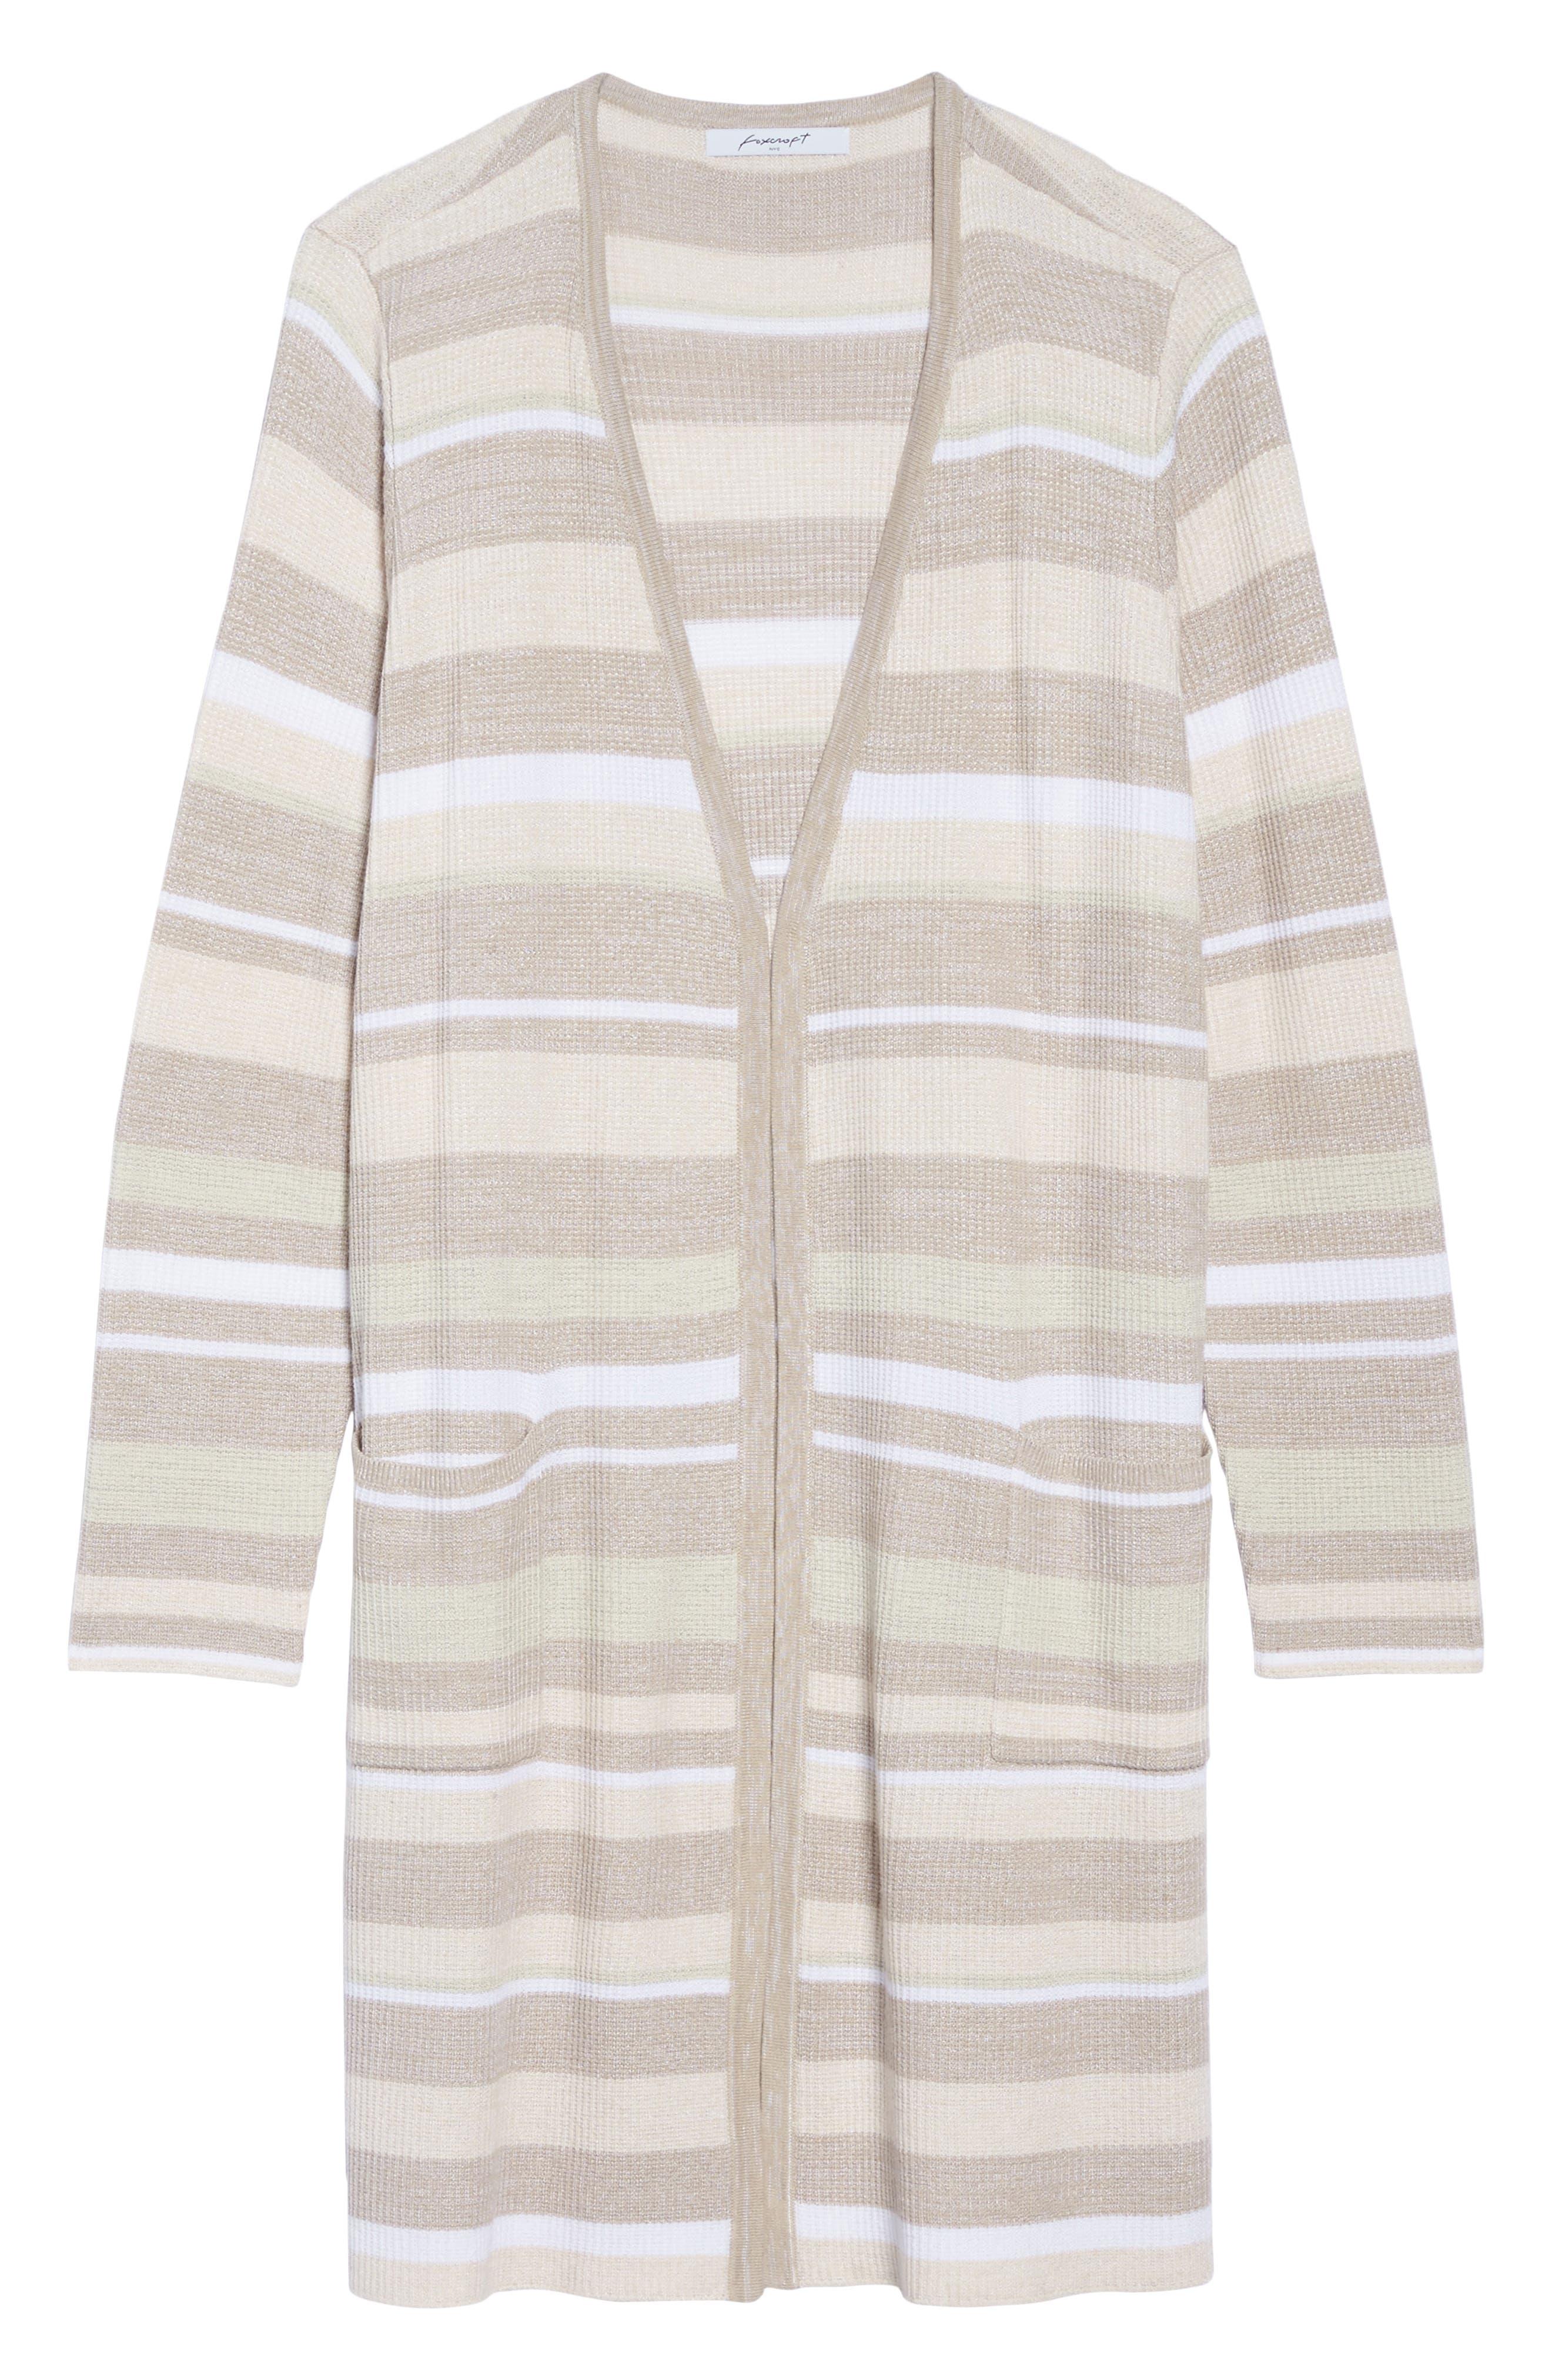 Rhona Textured Stripe Longline Cardigan,                             Alternate thumbnail 6, color,                             Neutral